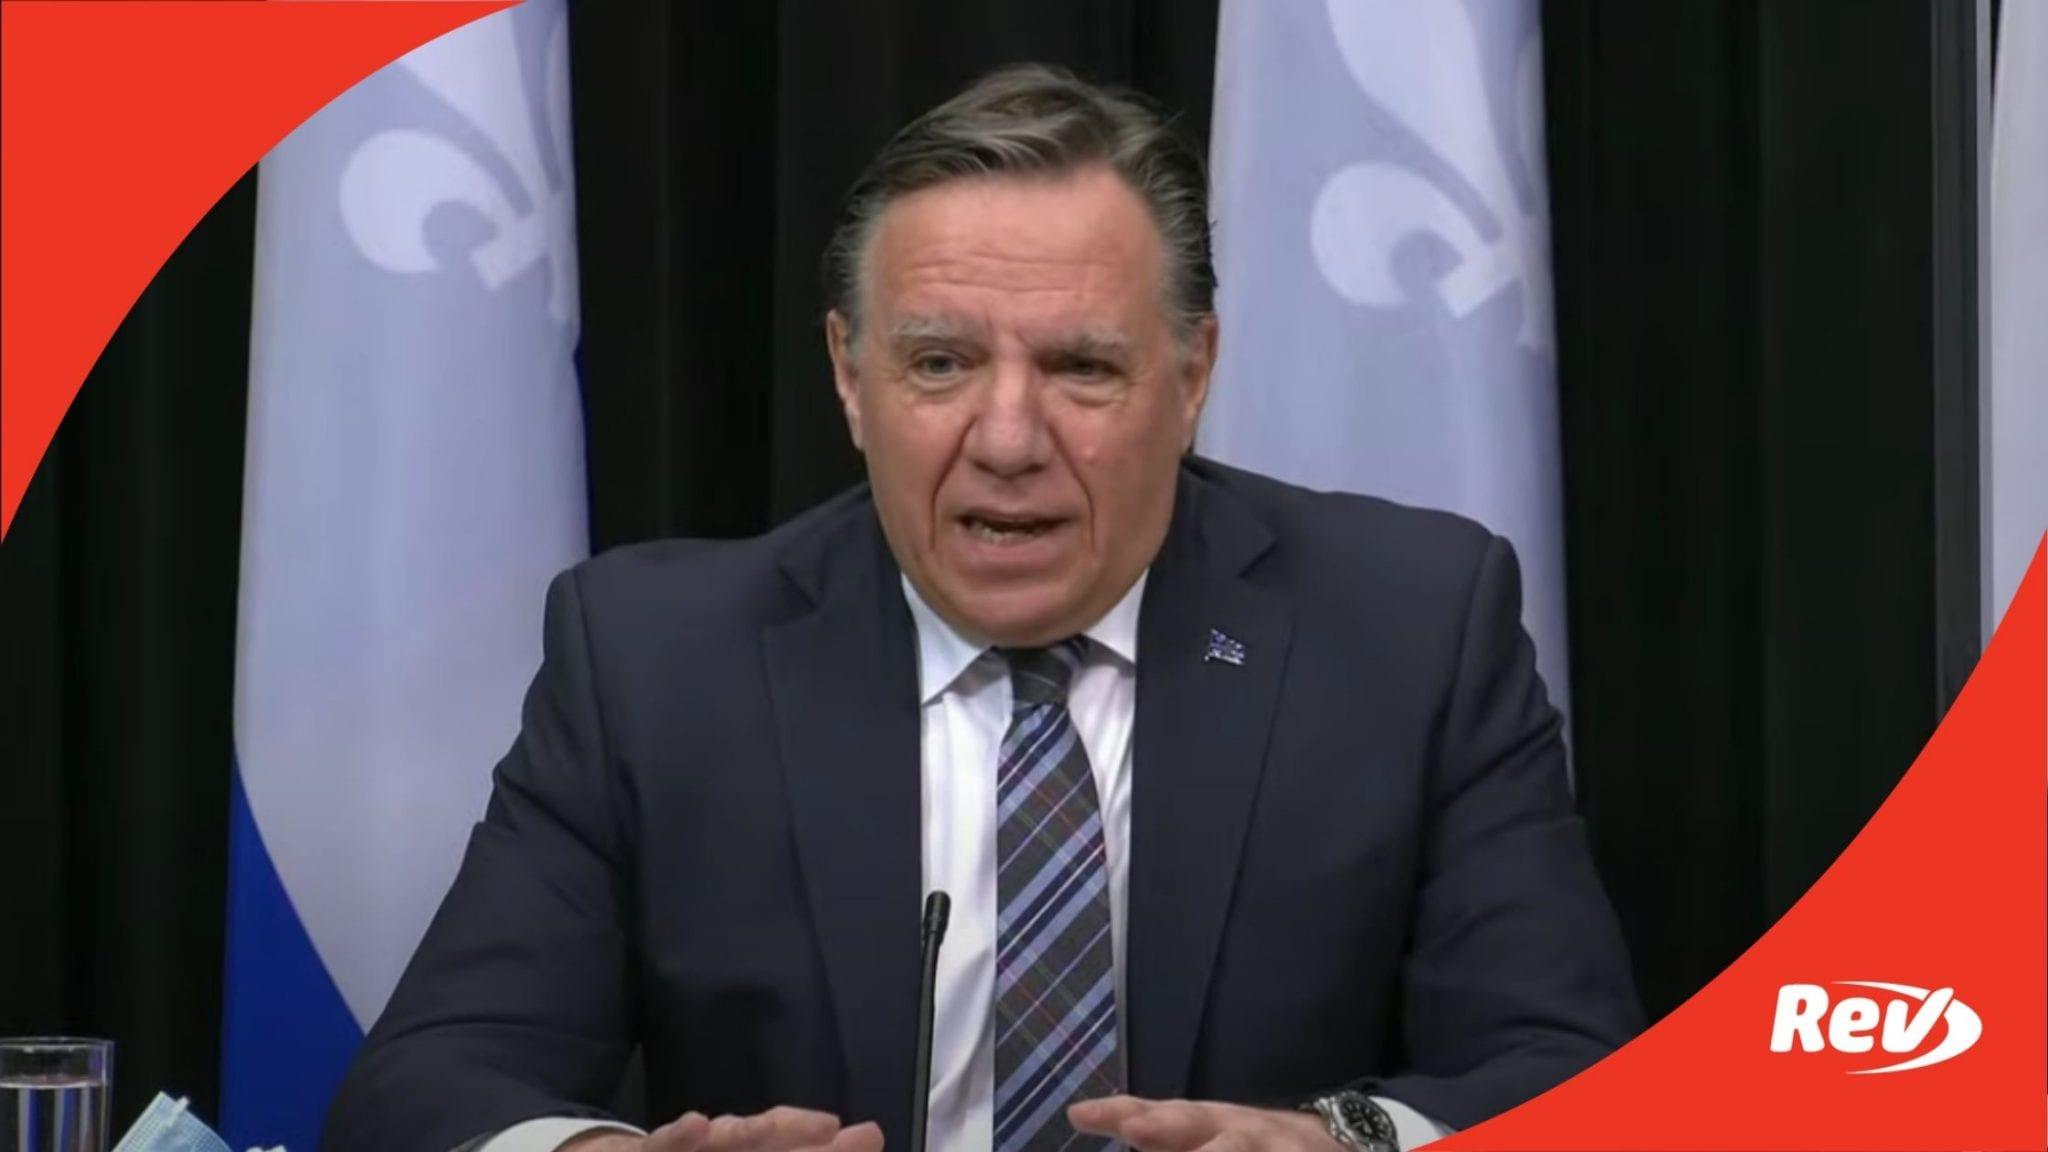 Quebec, CA François Legault Press Conference on COVID-19 Restrictions Transcript April 13